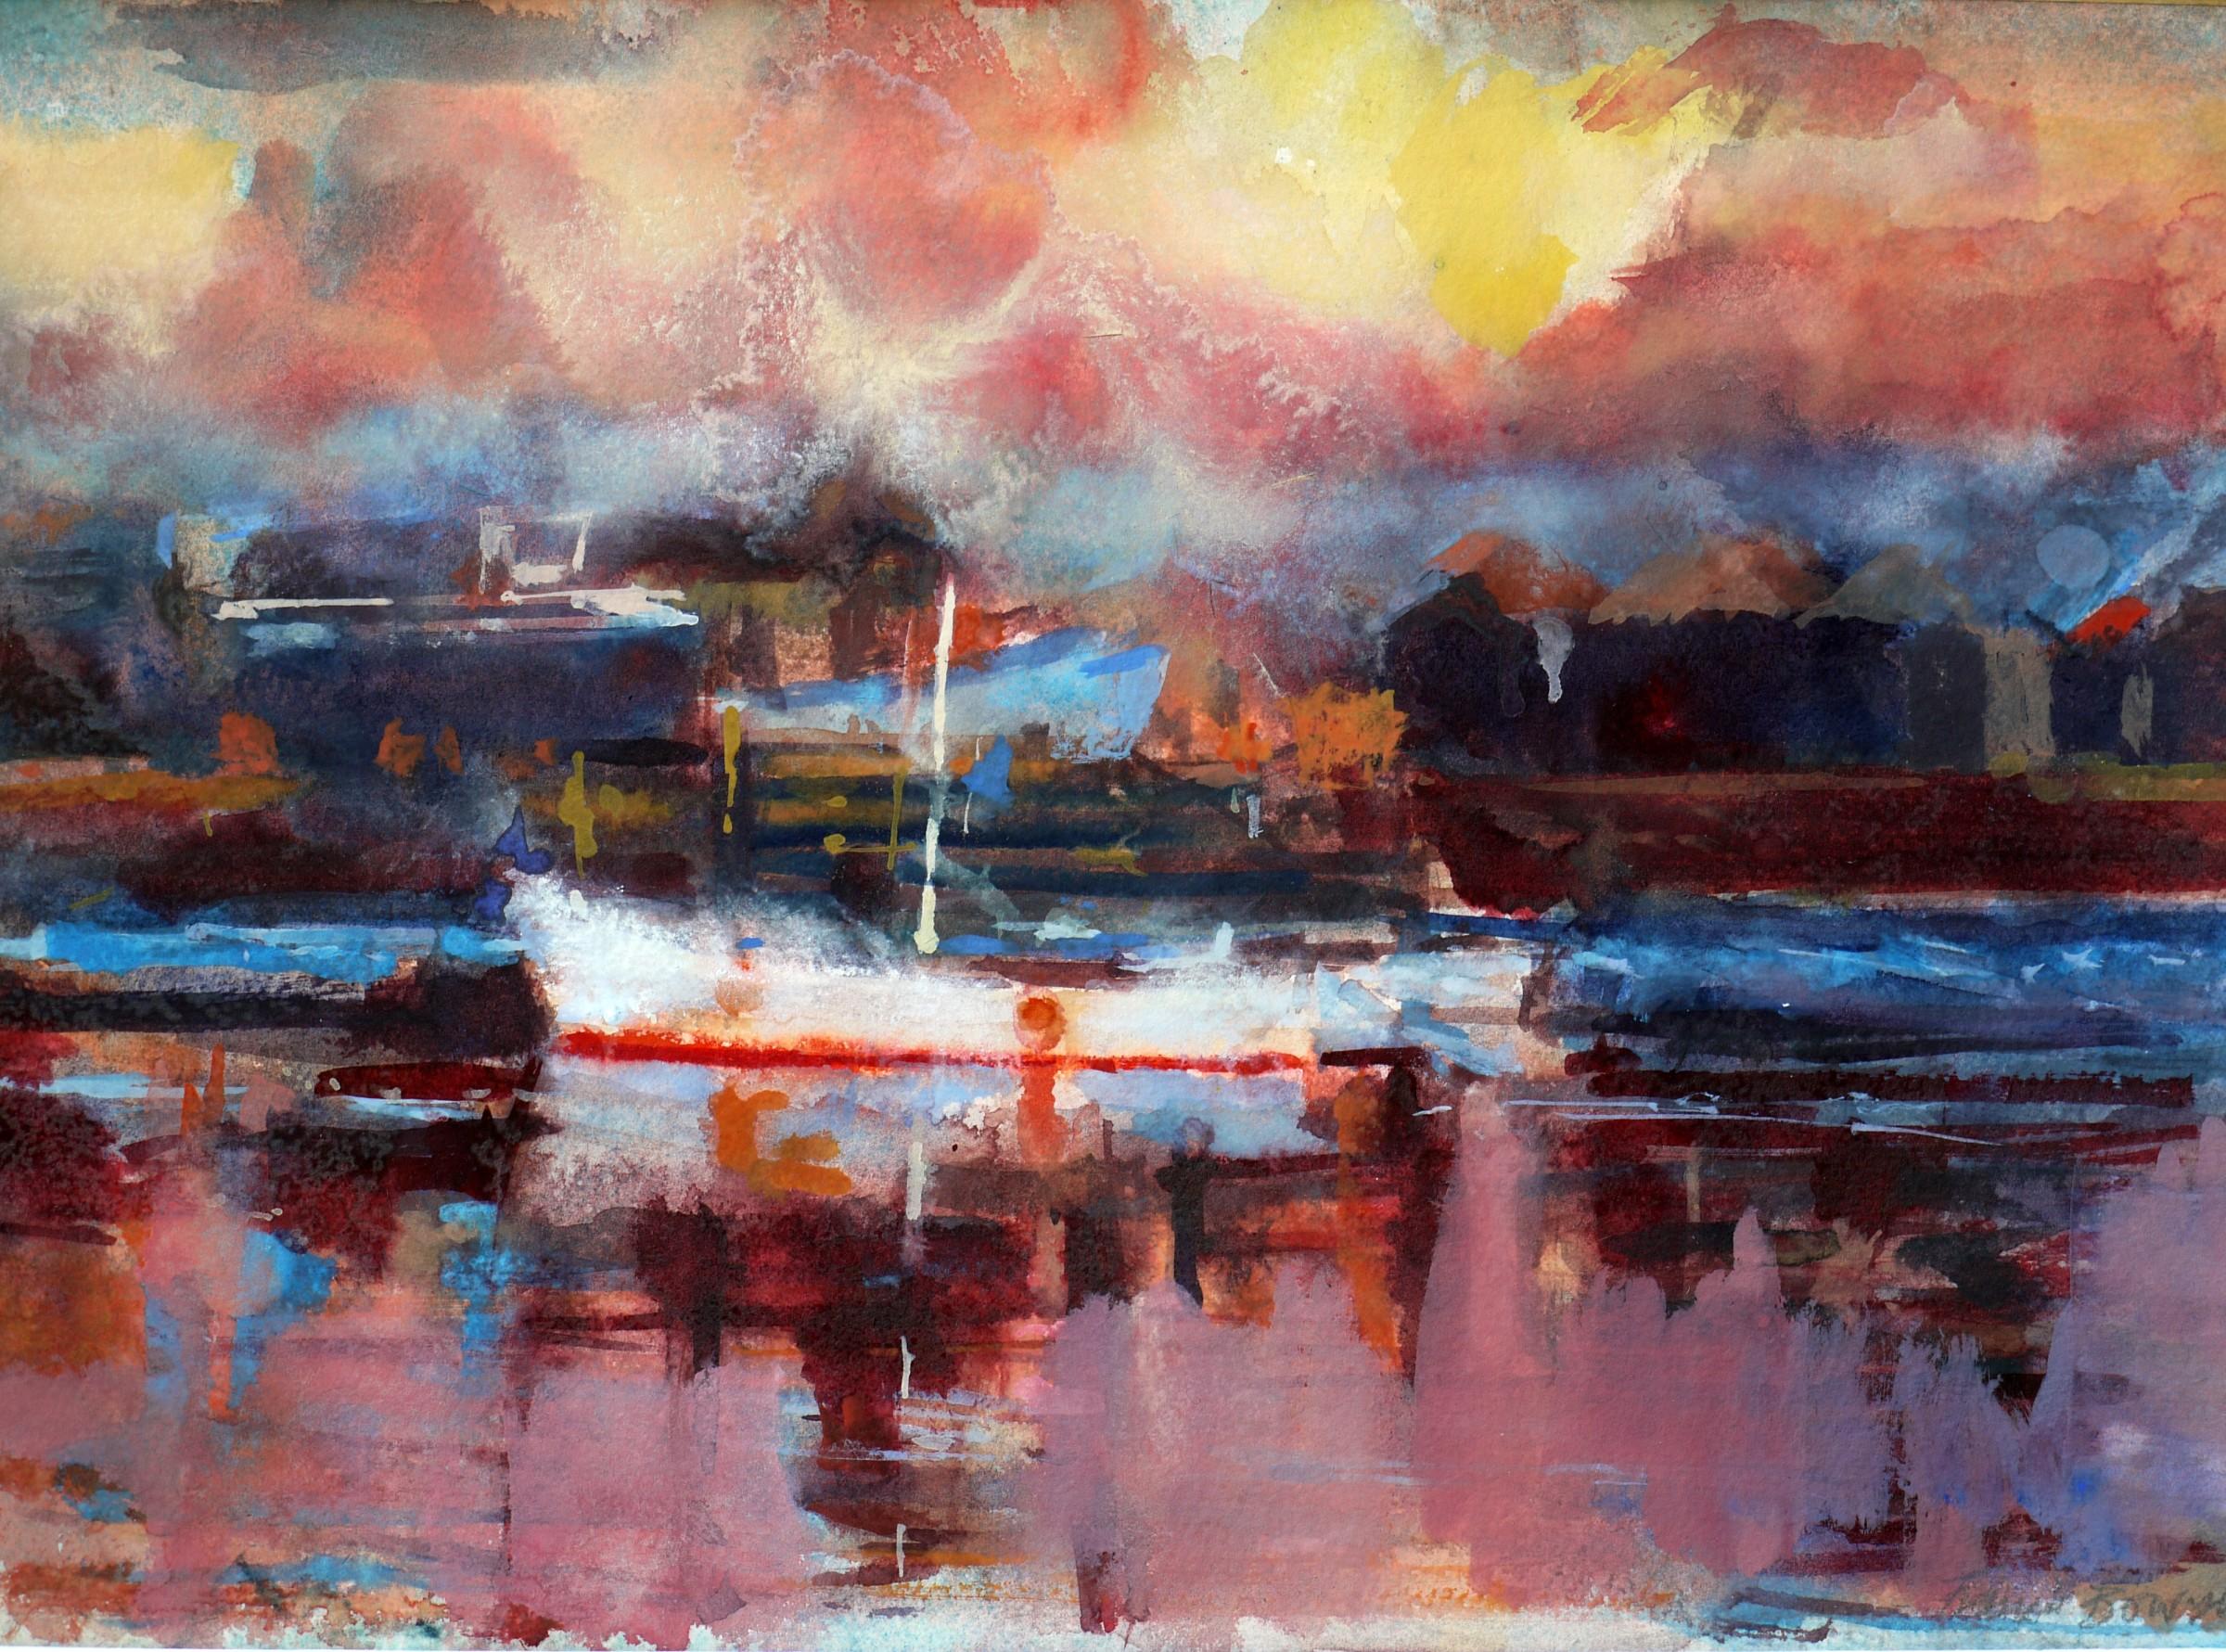 <span class=&#34;link fancybox-details-link&#34;><a href=&#34;/exhibitions/24/works/artworks_standalone10840/&#34;>View Detail Page</a></span><div class=&#34;artist&#34;><span class=&#34;artist&#34;><strong>Francis Bowyer</strong></span></div><div class=&#34;title&#34;><em>Fishing Boat</em></div><div class=&#34;medium&#34;>watercolour</div>